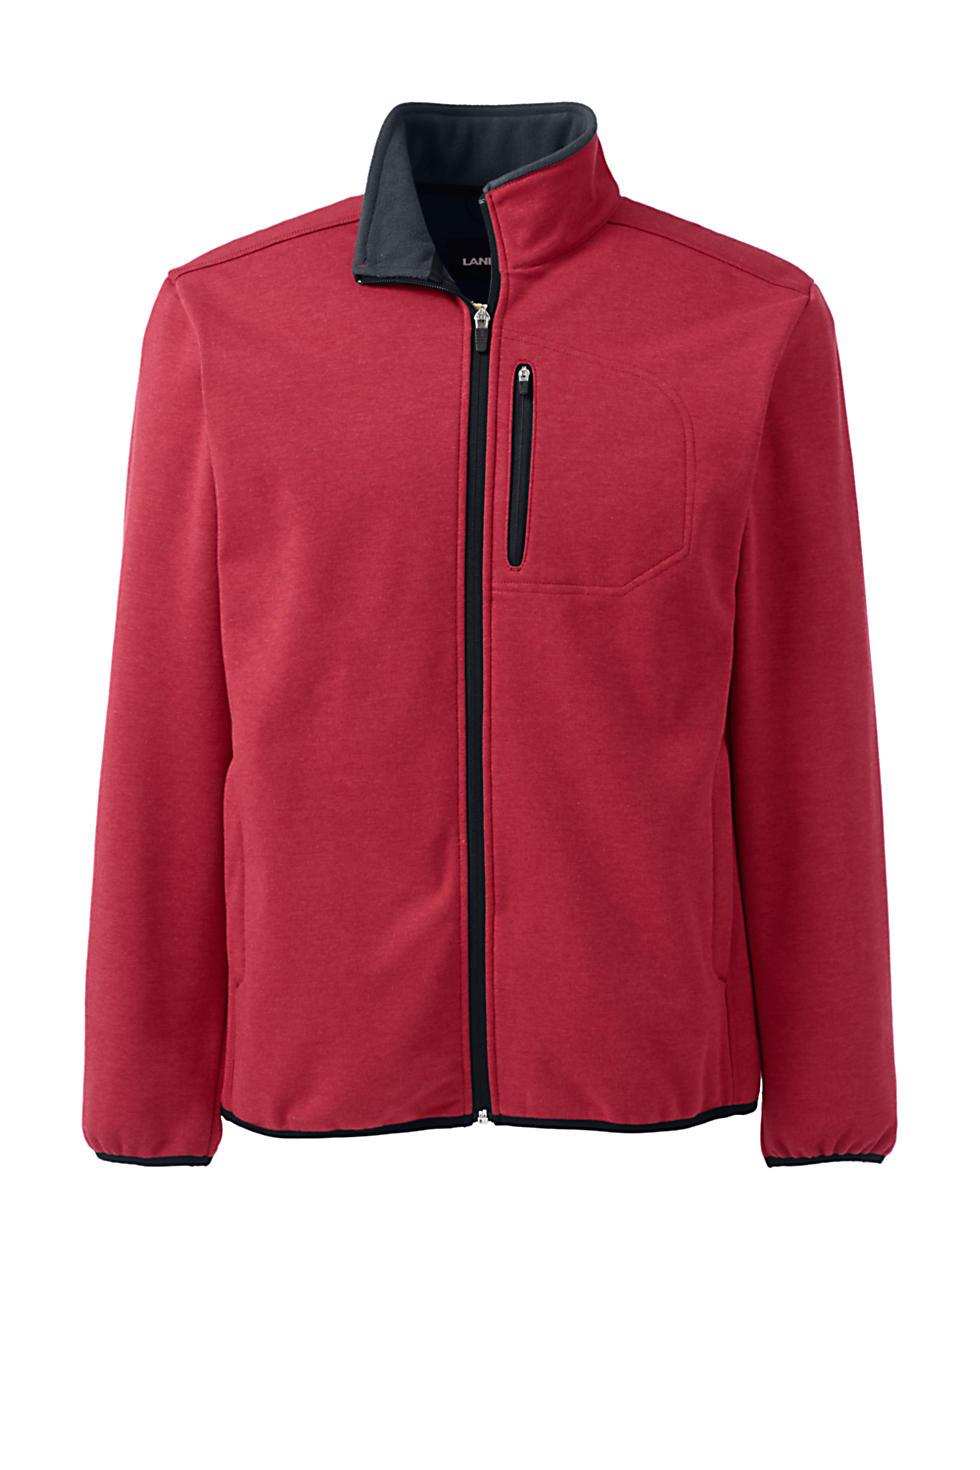 Lands End Mens Marinac Windproof Fleece Jacket (2 color options)